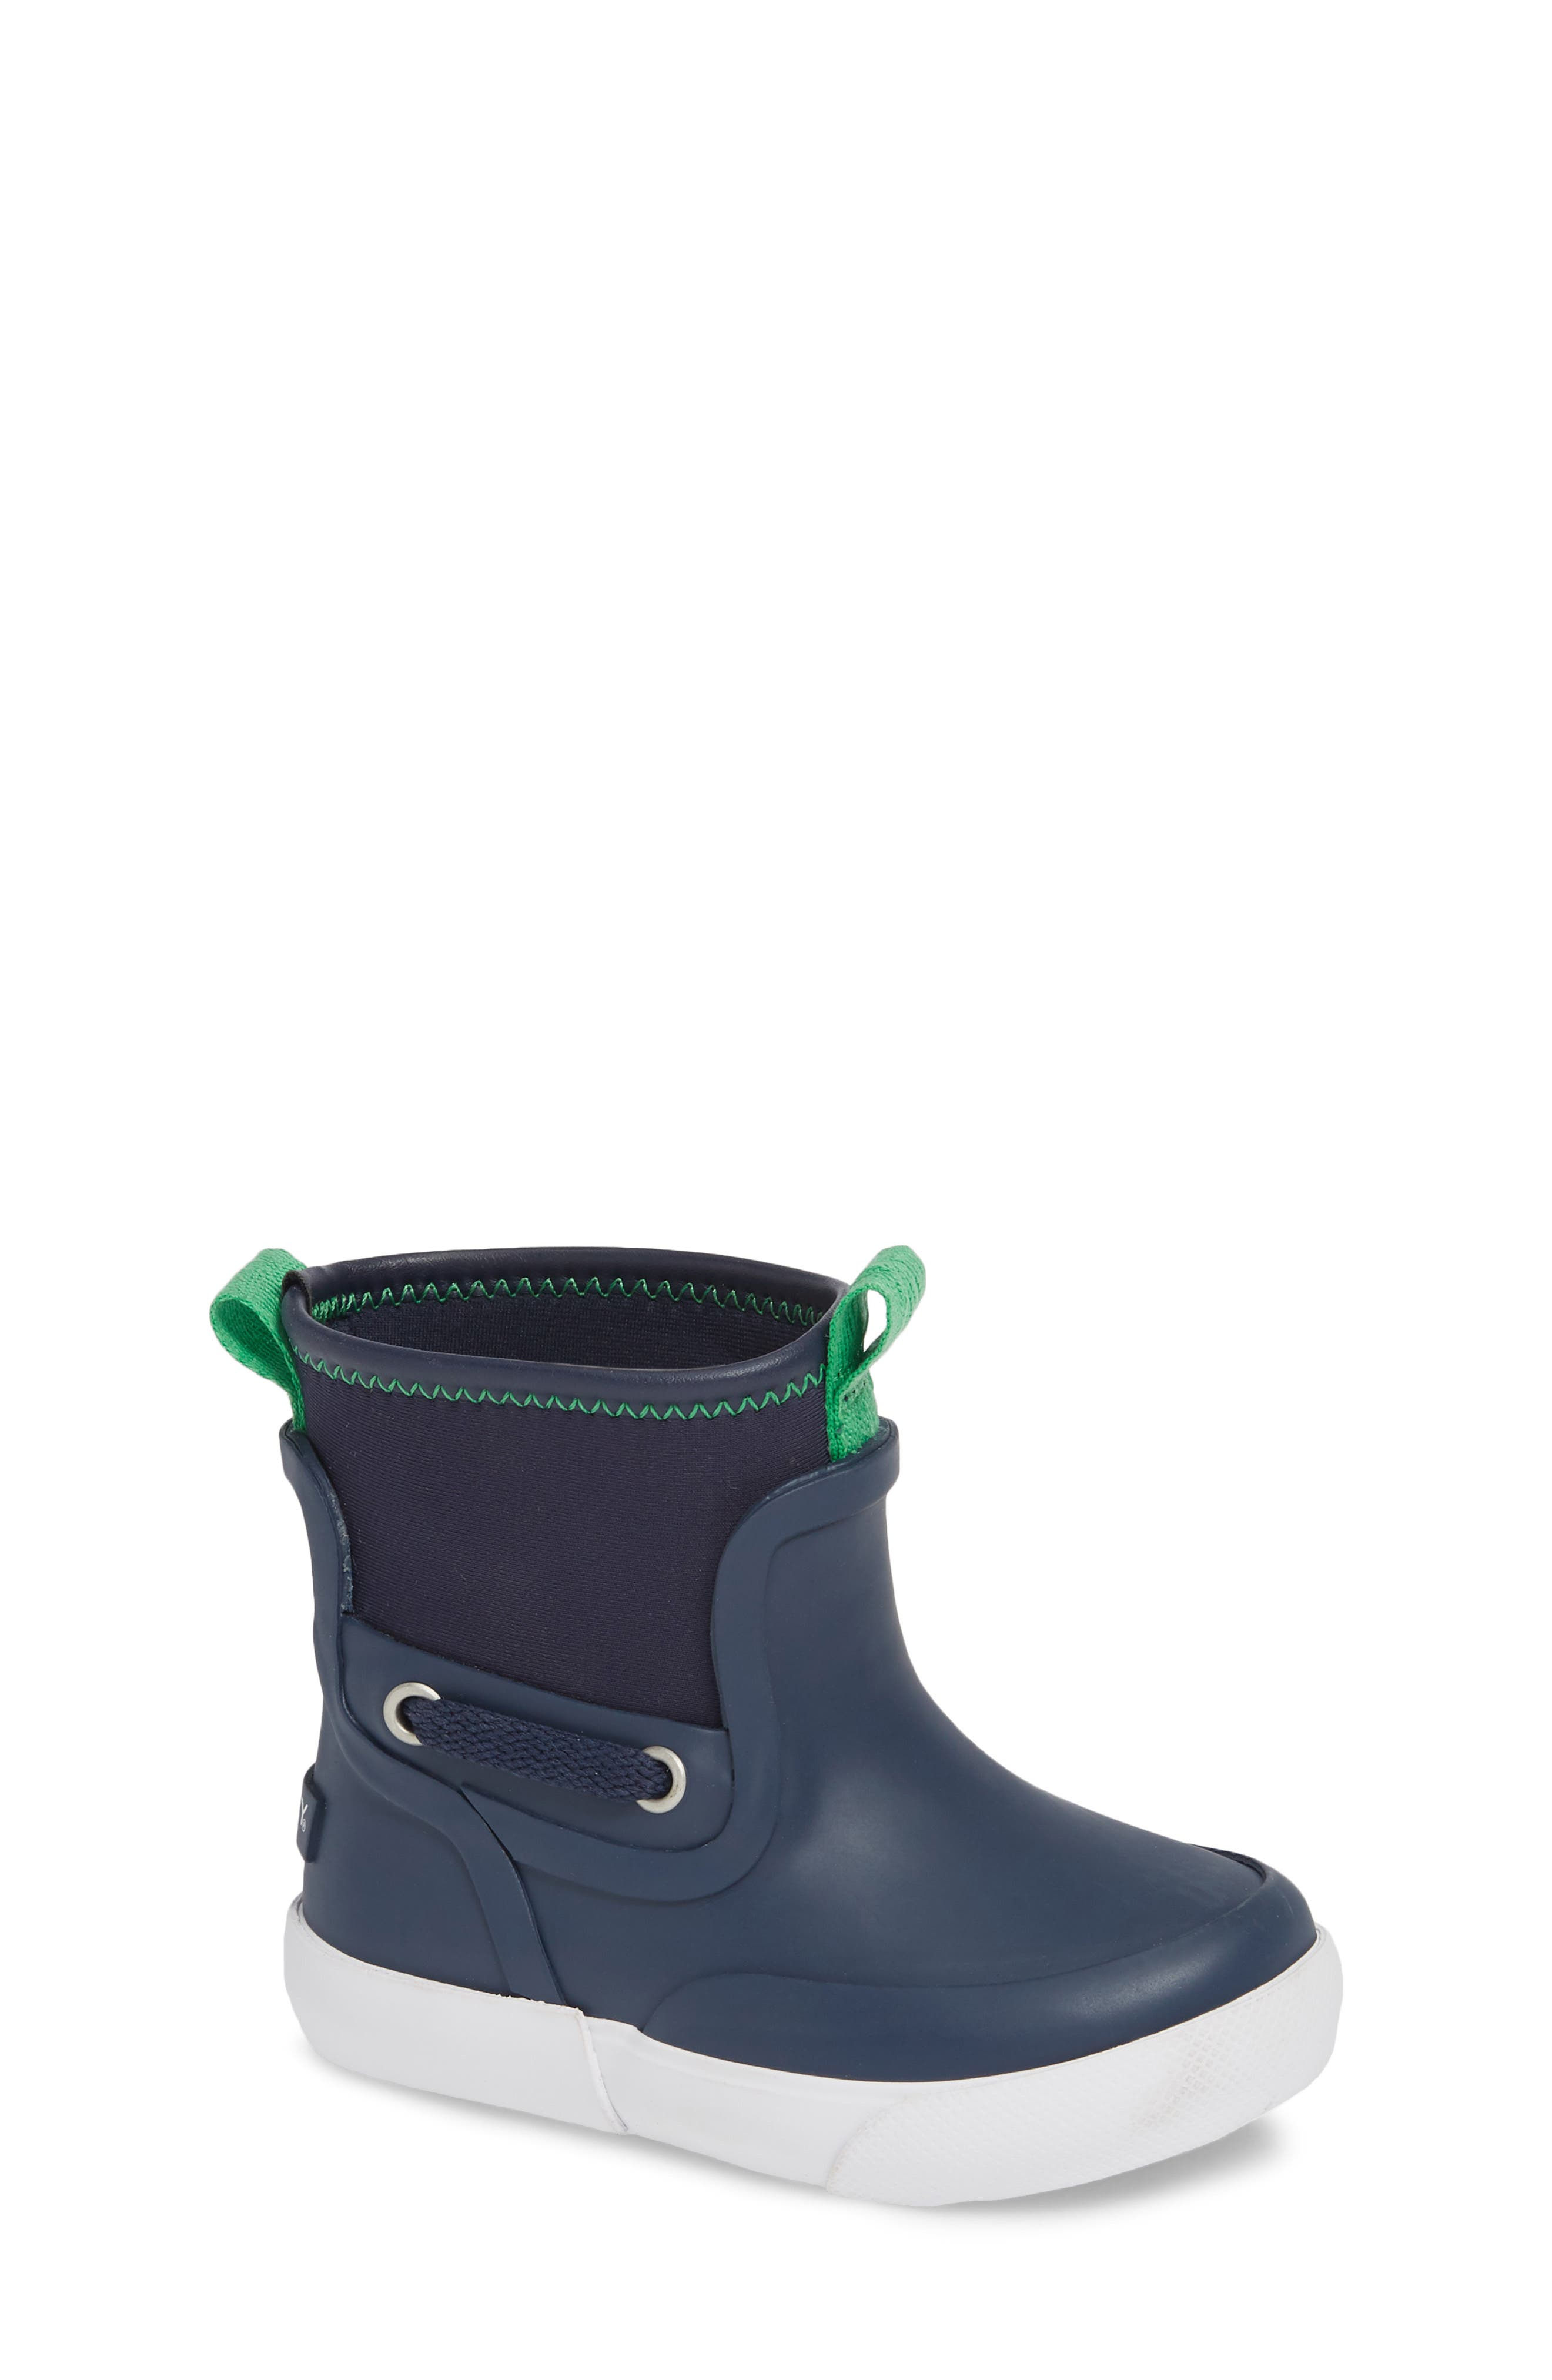 Toddler Sperry Kids Seawall Boot, Blue